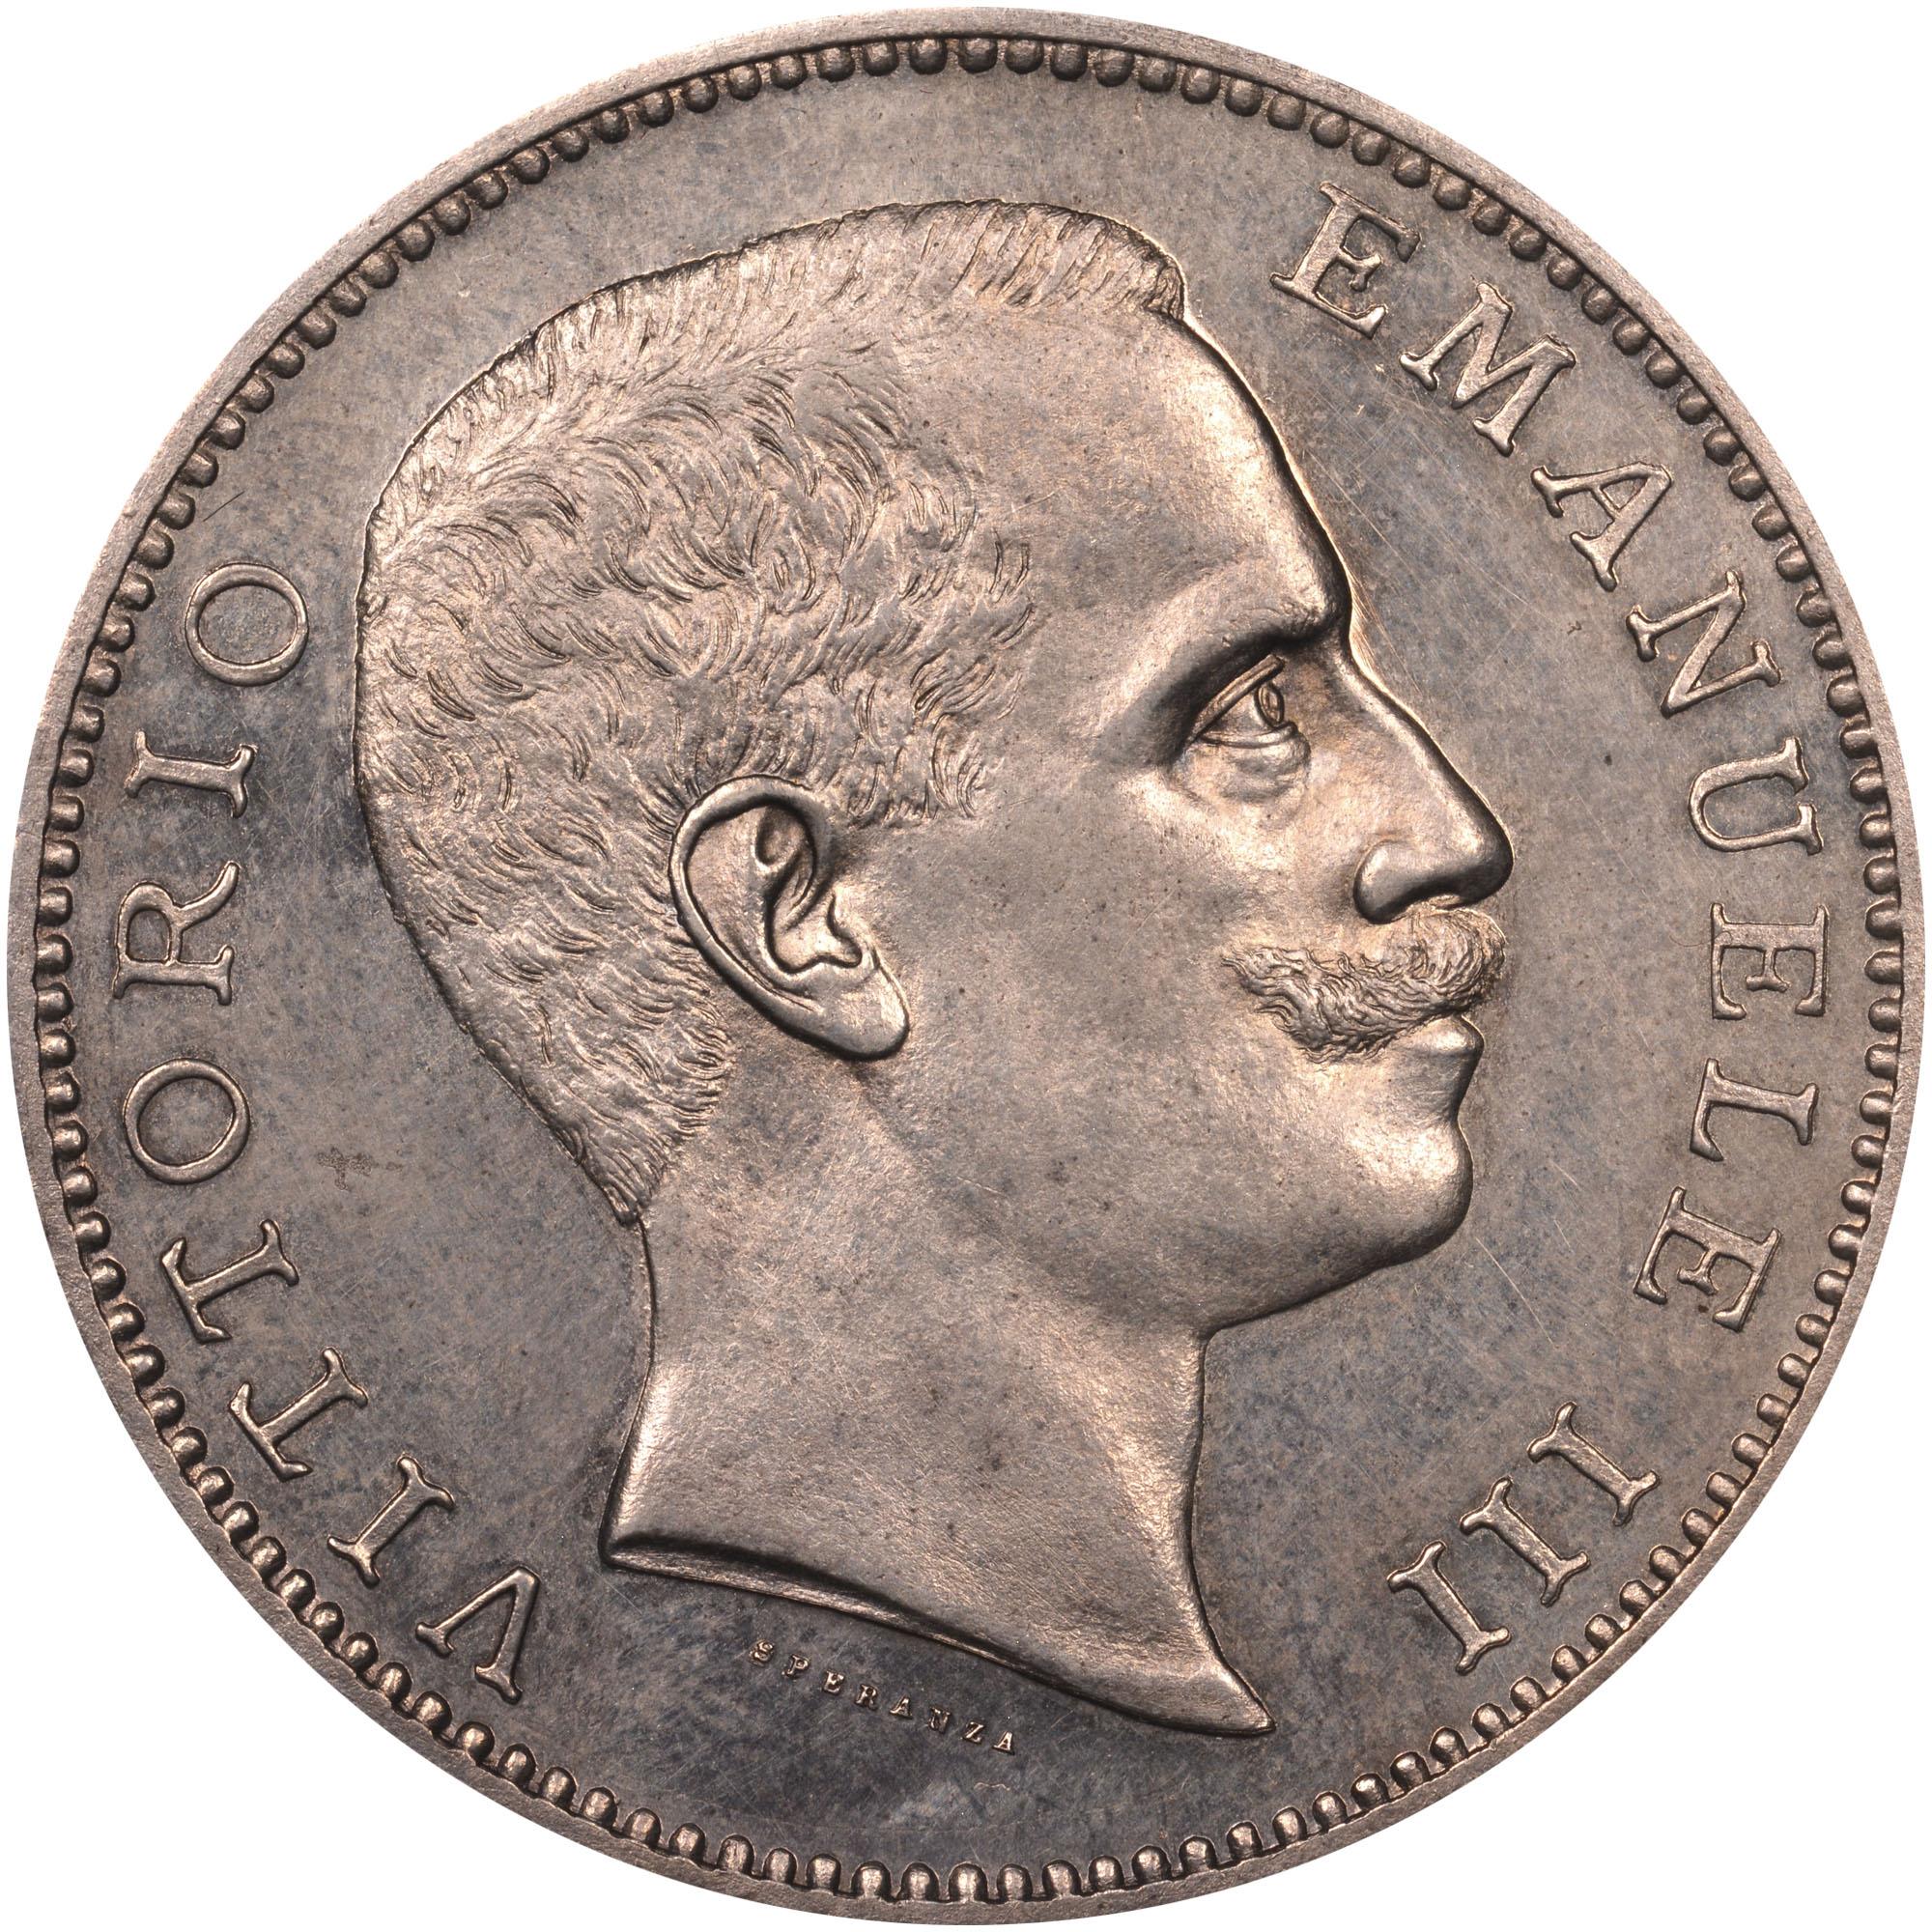 1901 Italy 5 Lire obverse